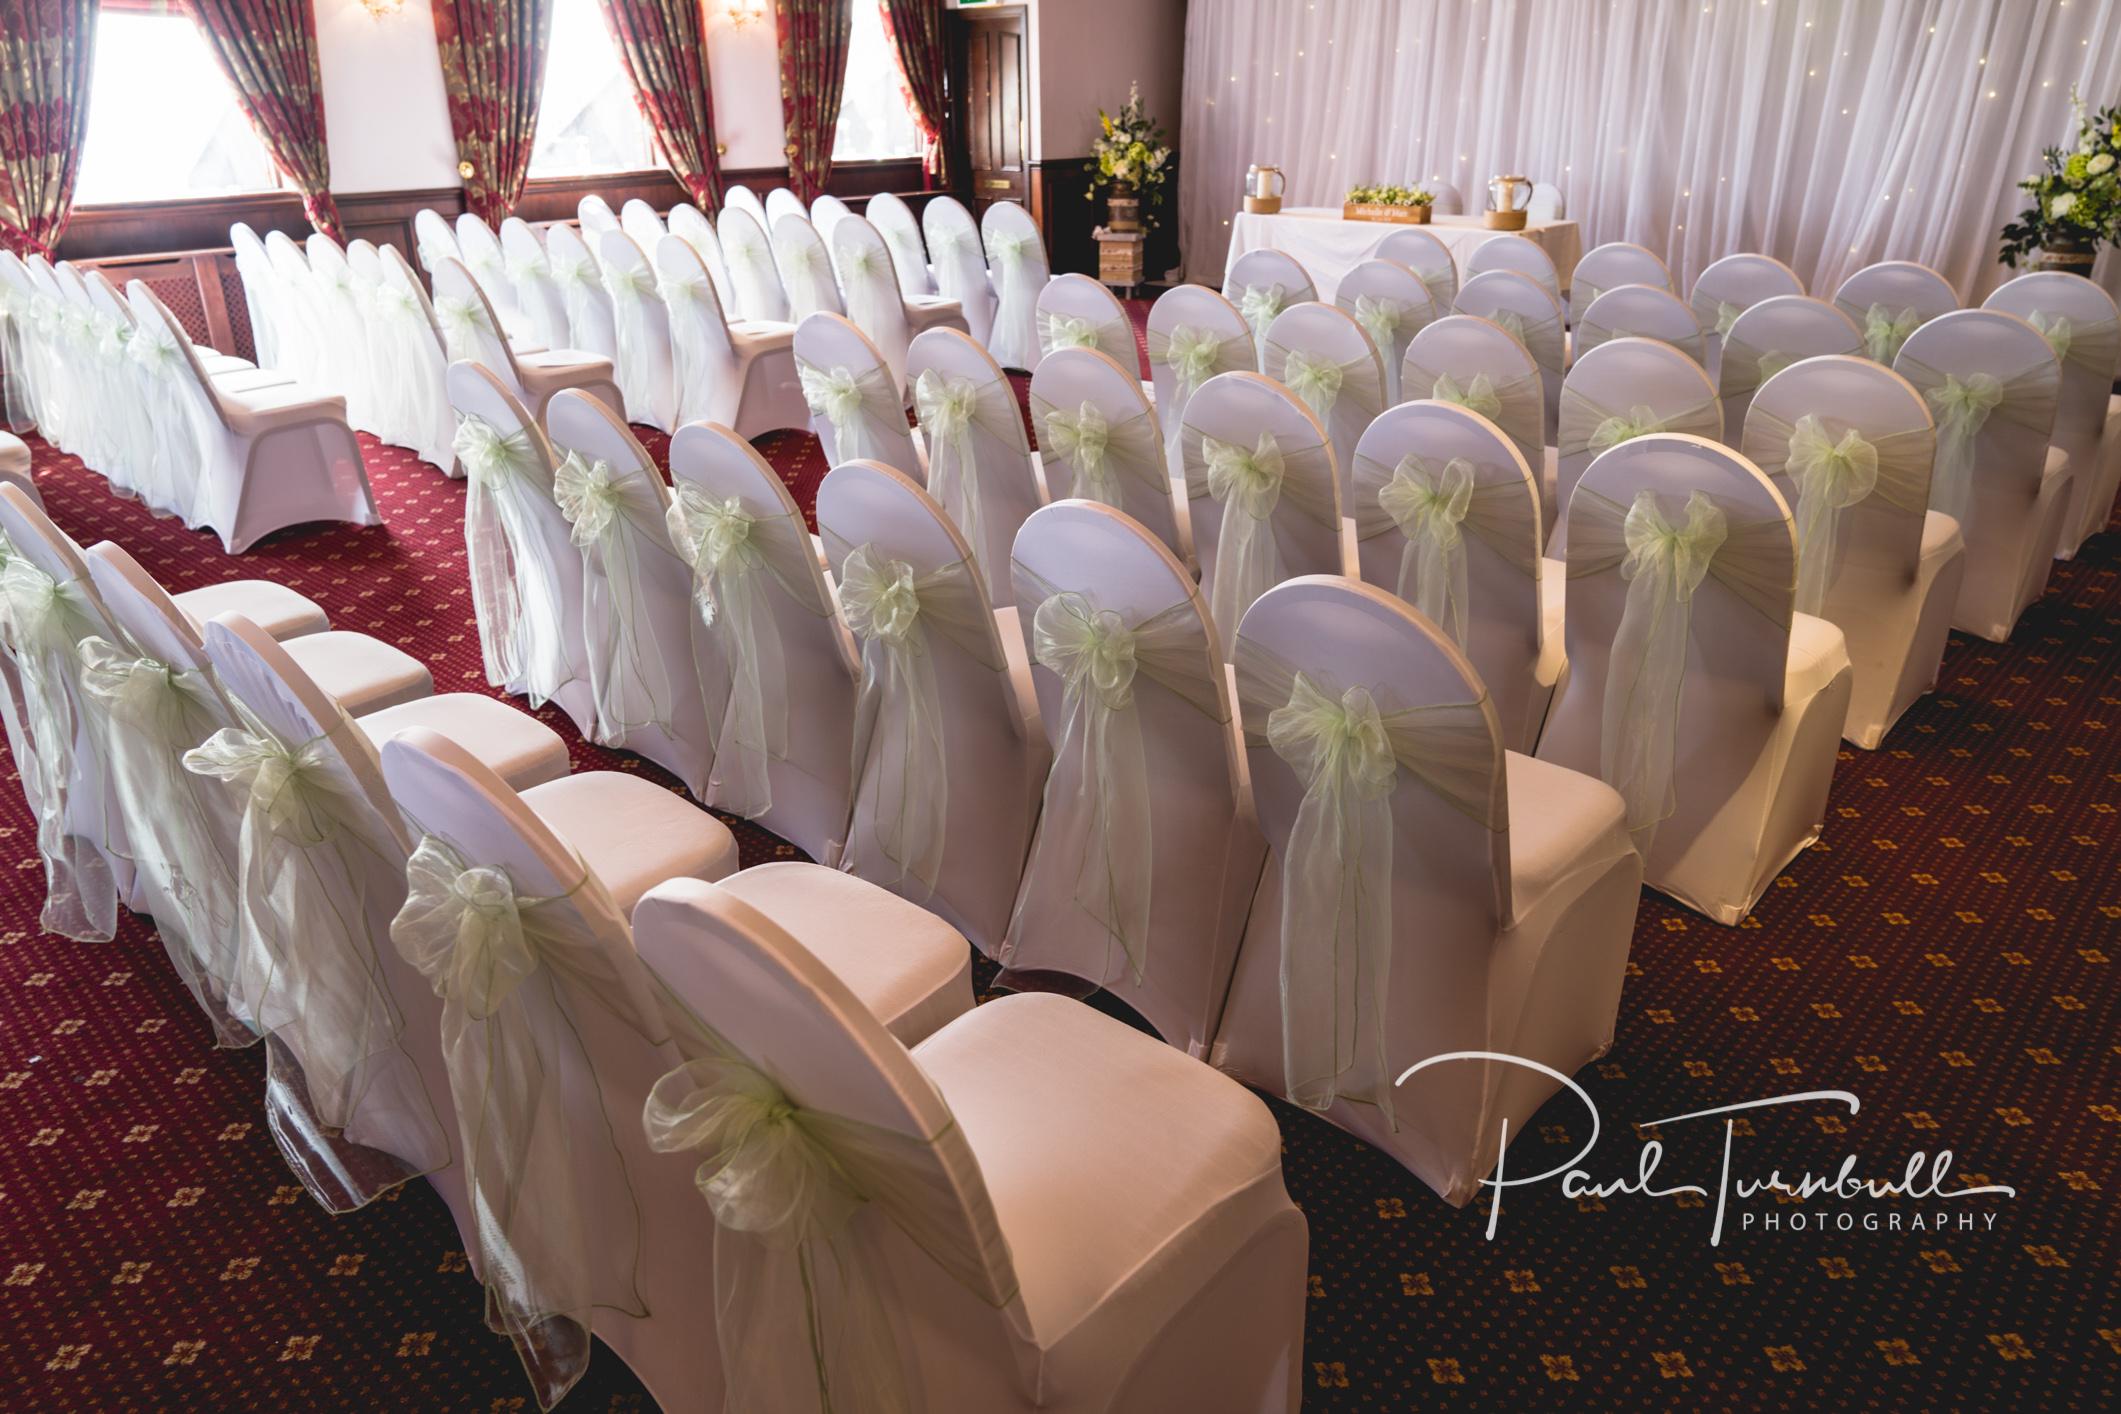 Wedding Photography Pennine Manor Huddersfield Yorkshire